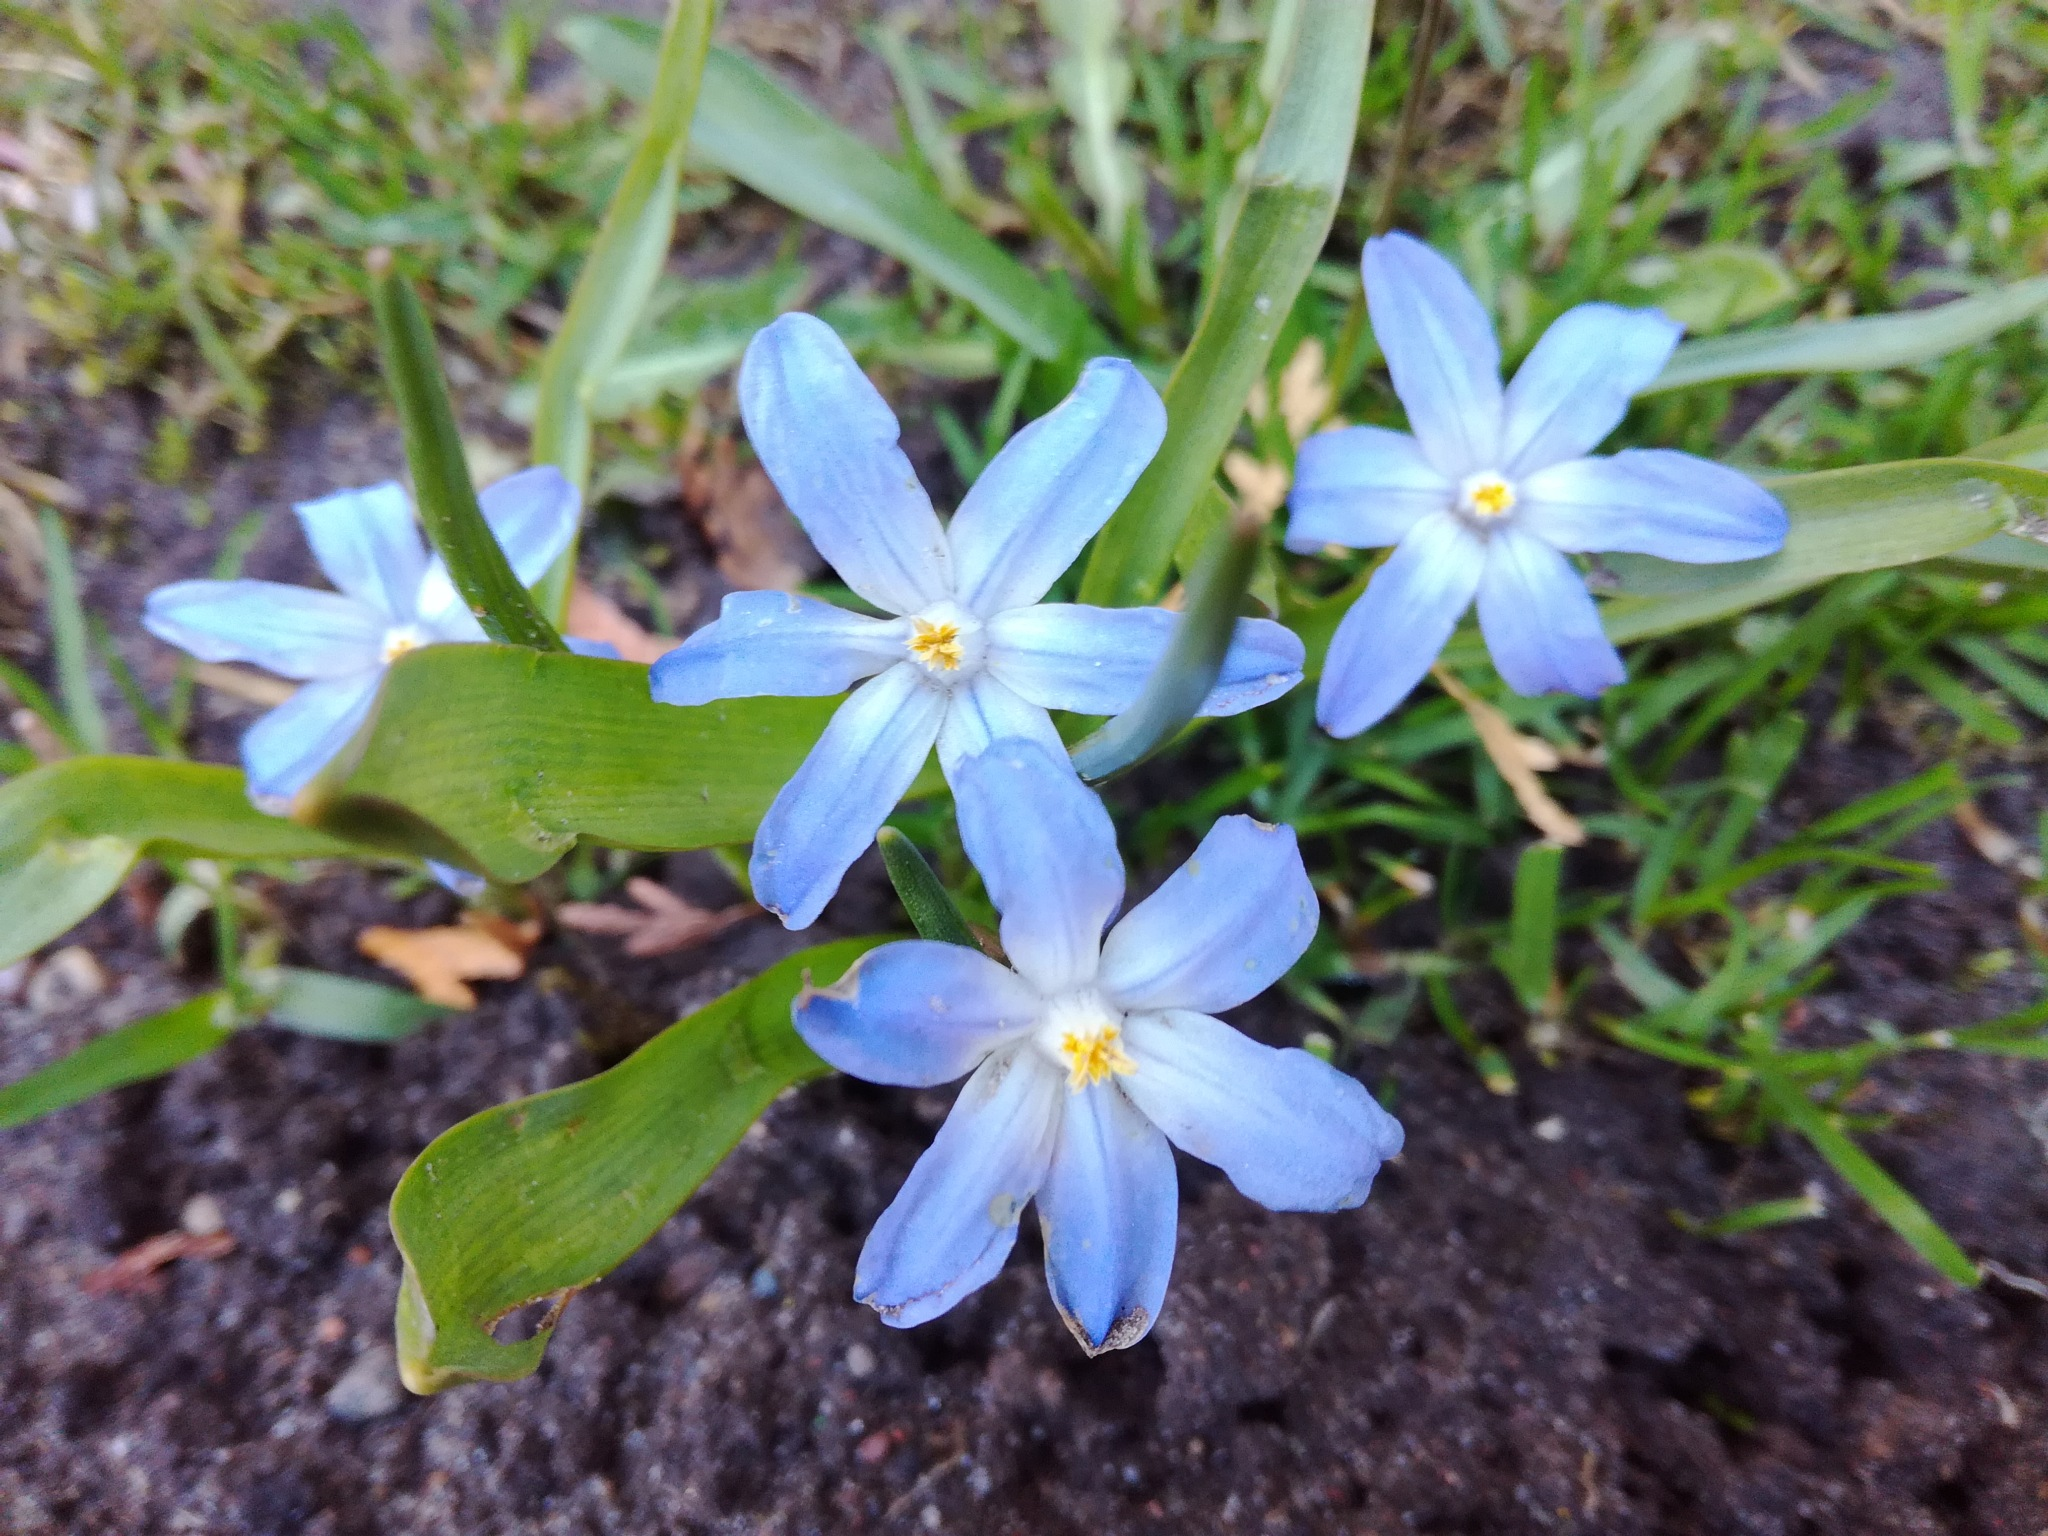 Blue flowers by uzkuraitiene62